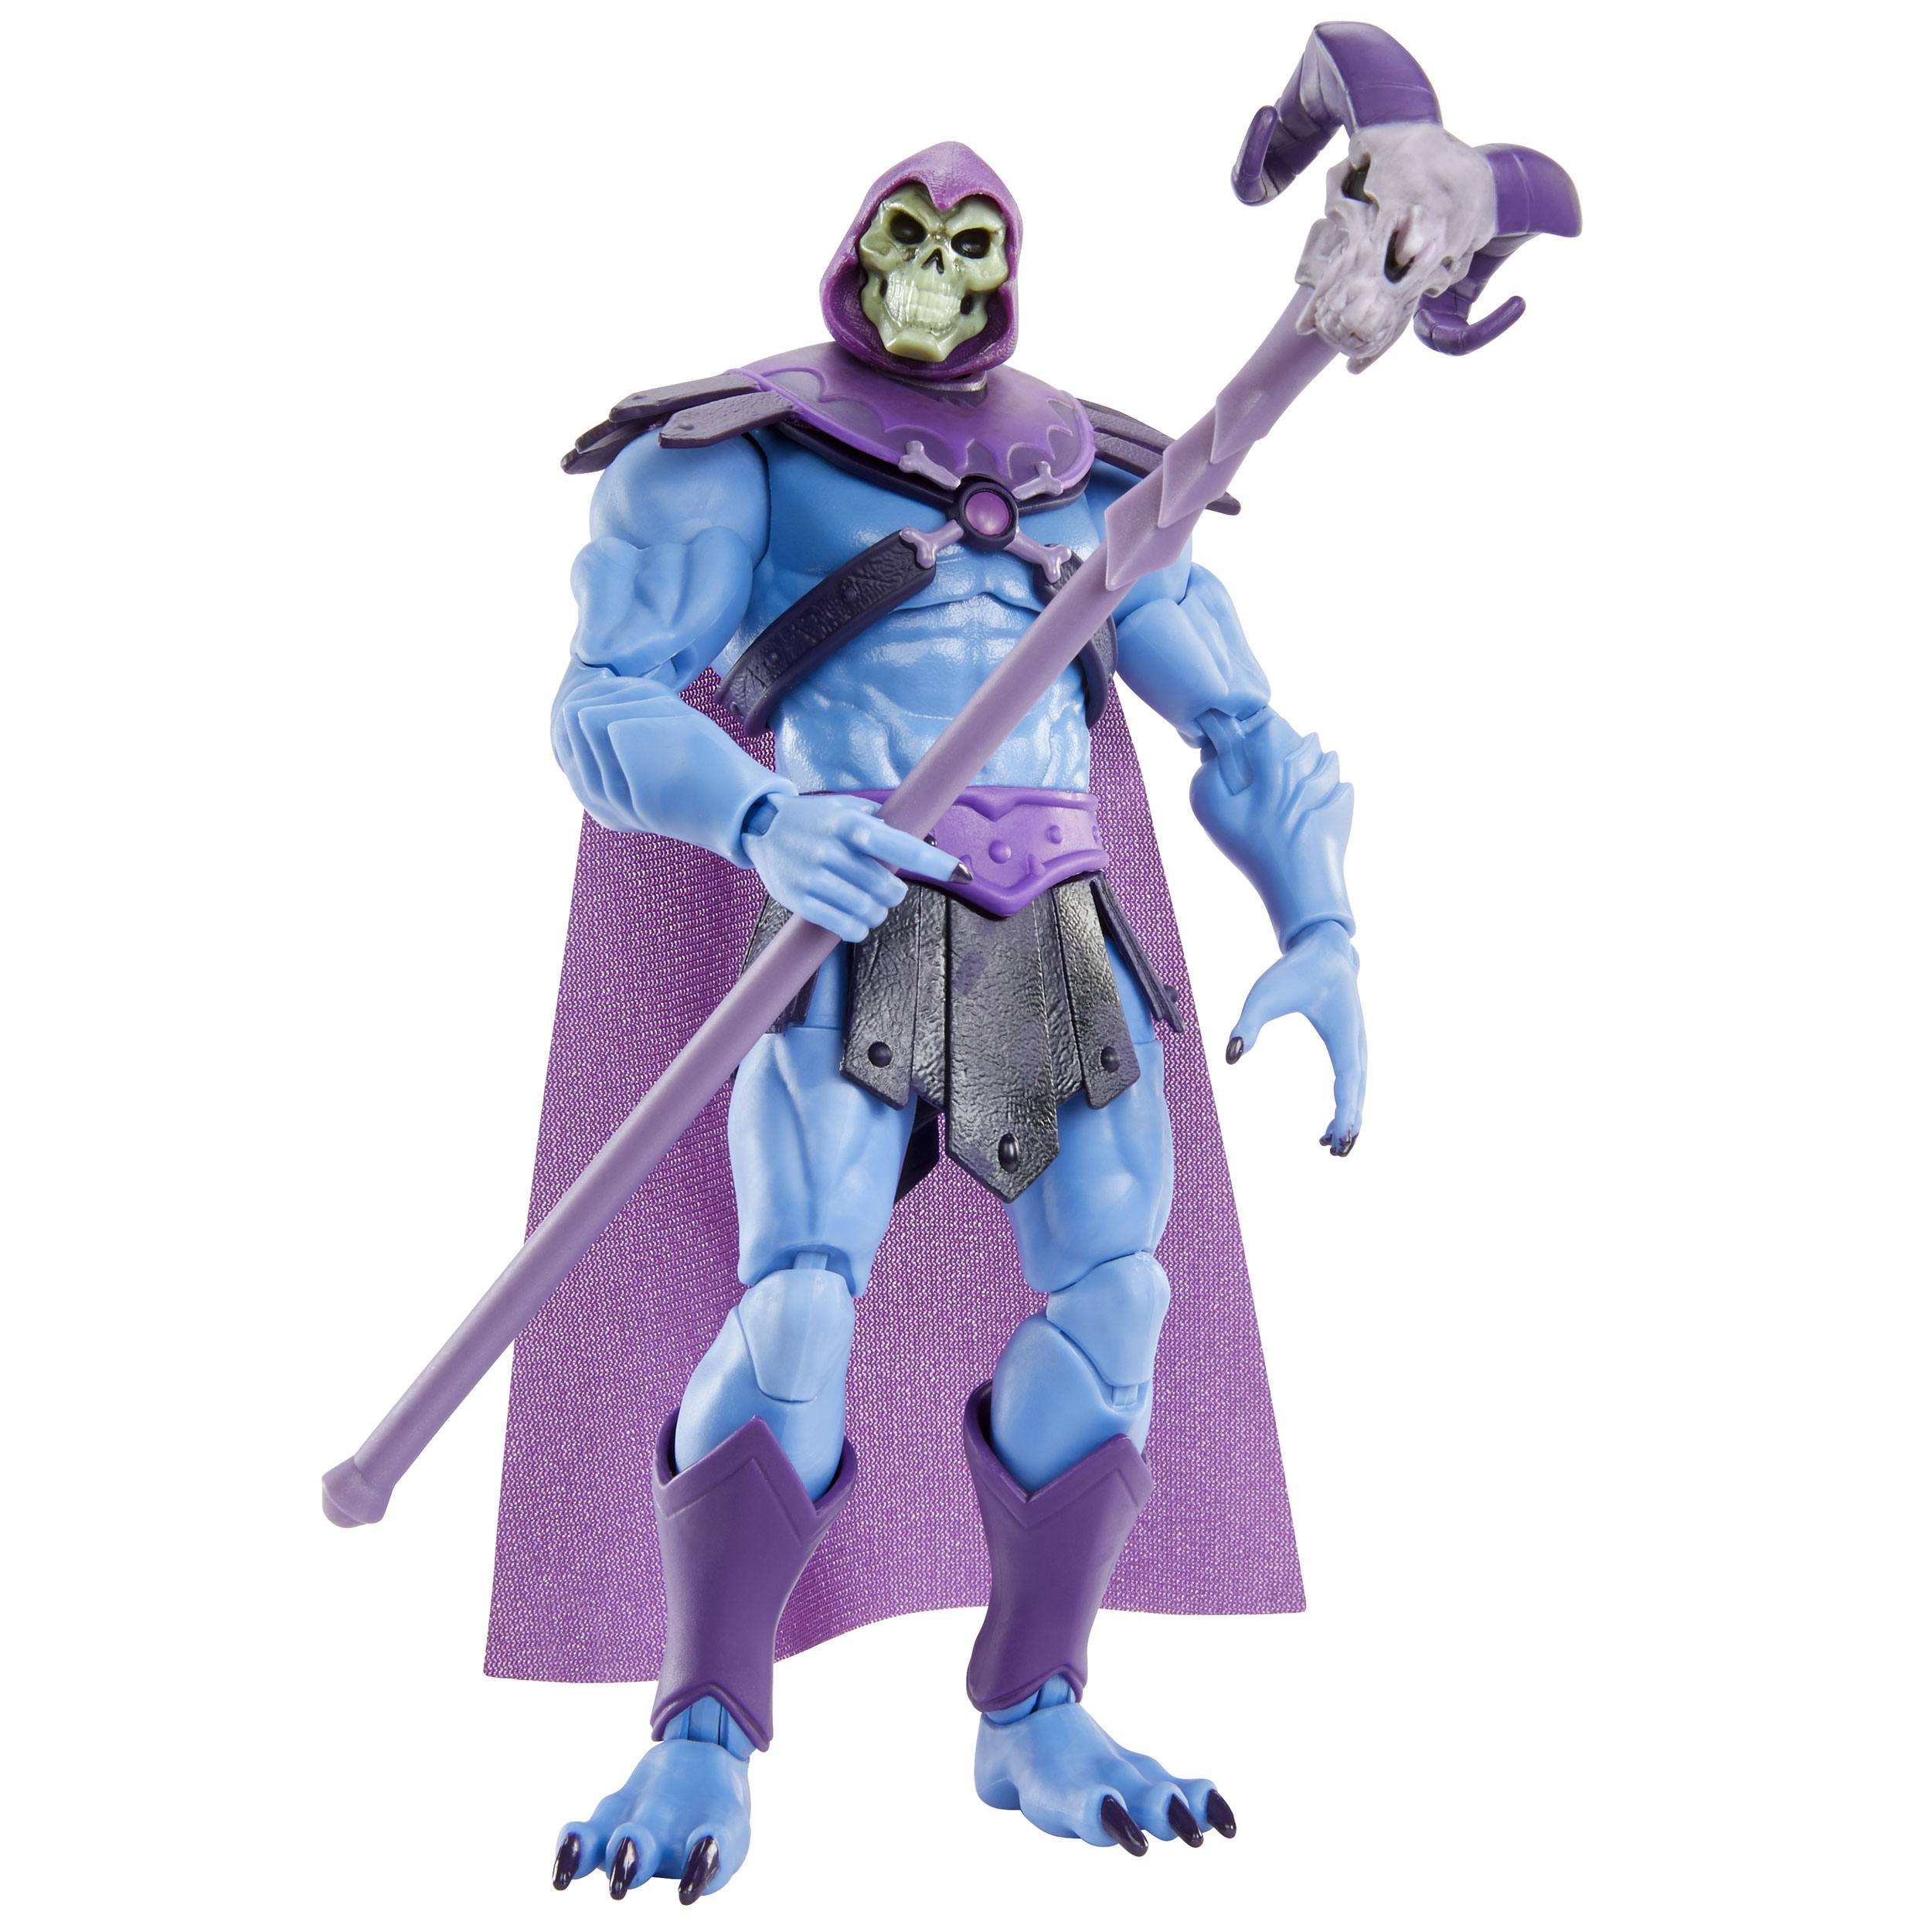 IMPORT !!! Masters of the Universe: Revelation Masterverse Actionfigur 2021 Skeletor 18 cm MATTGYV10 0887961979879